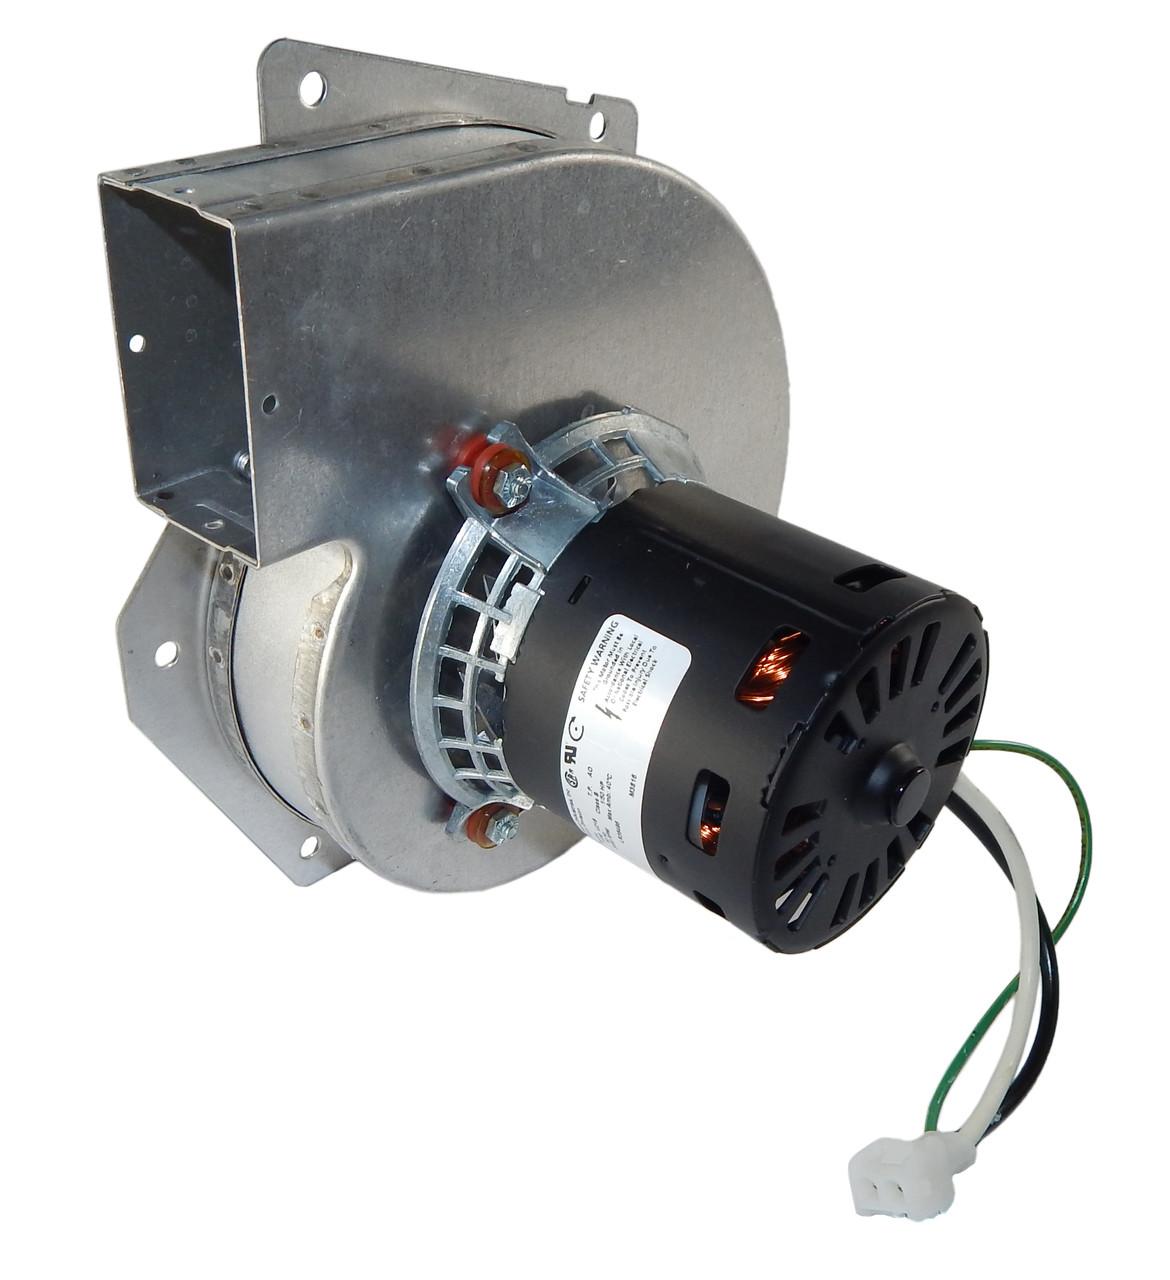 trane furnace draft inducer blower jakel j238 138 1344 115v fasco a143 [ 1170 x 1280 Pixel ]